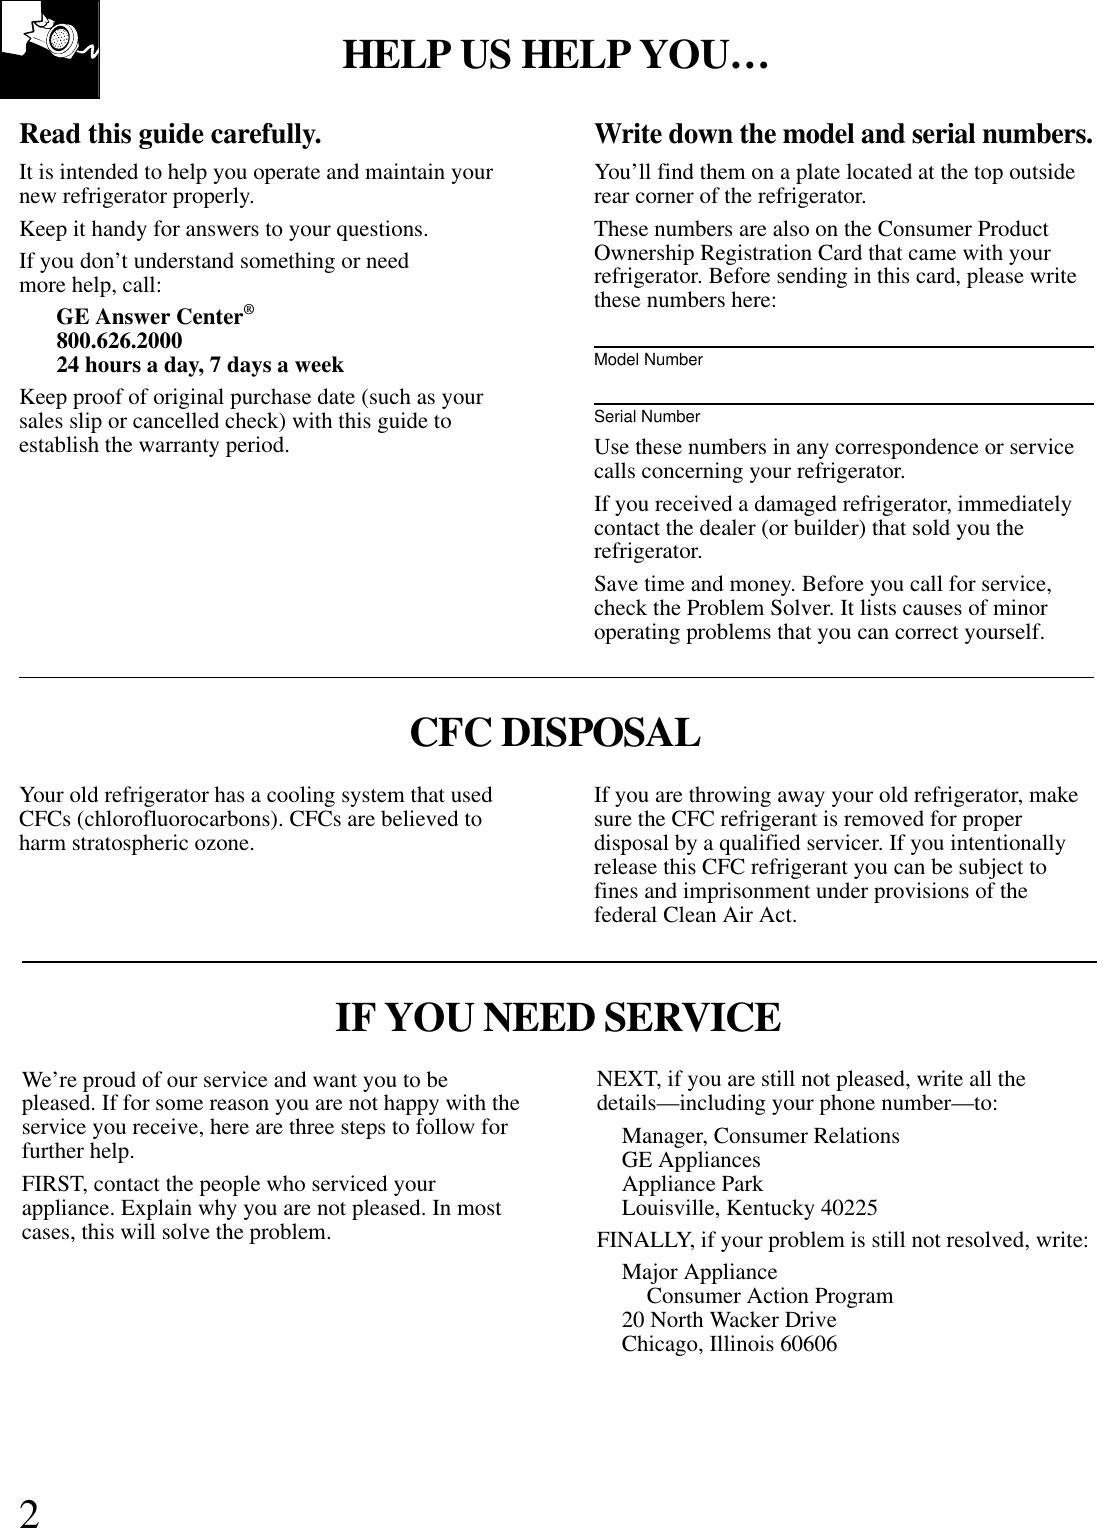 GE SC4 User Manual To The 4a228cca d1e7 46f4 bbe8 f903c11f9bb4